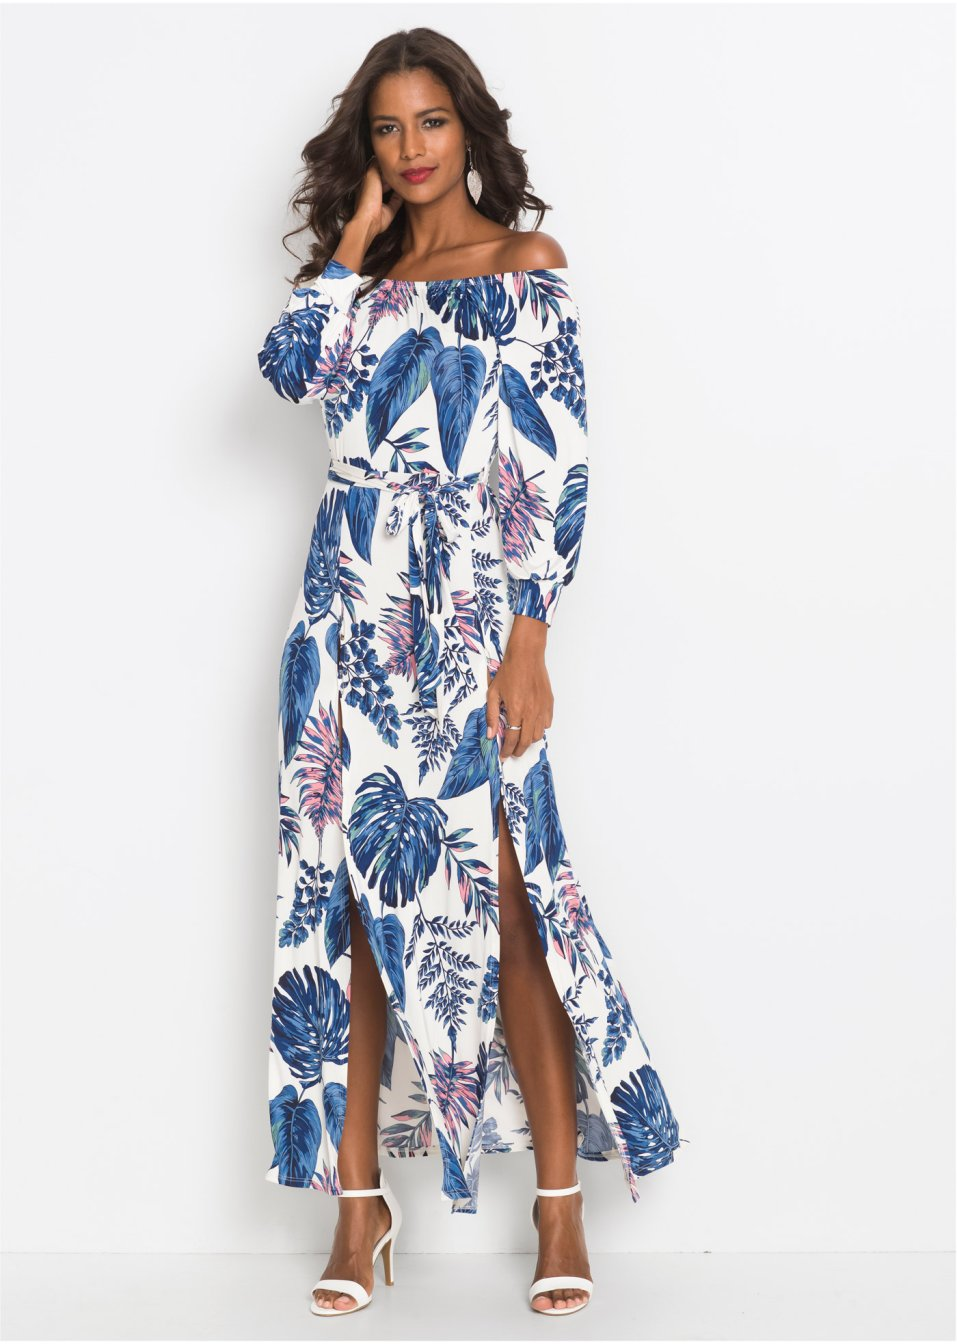 7e4a2190b43 Maxikleid mit Print weiß blau gemustert - Damen - BODYFLIRT boutique -  bonprix.de